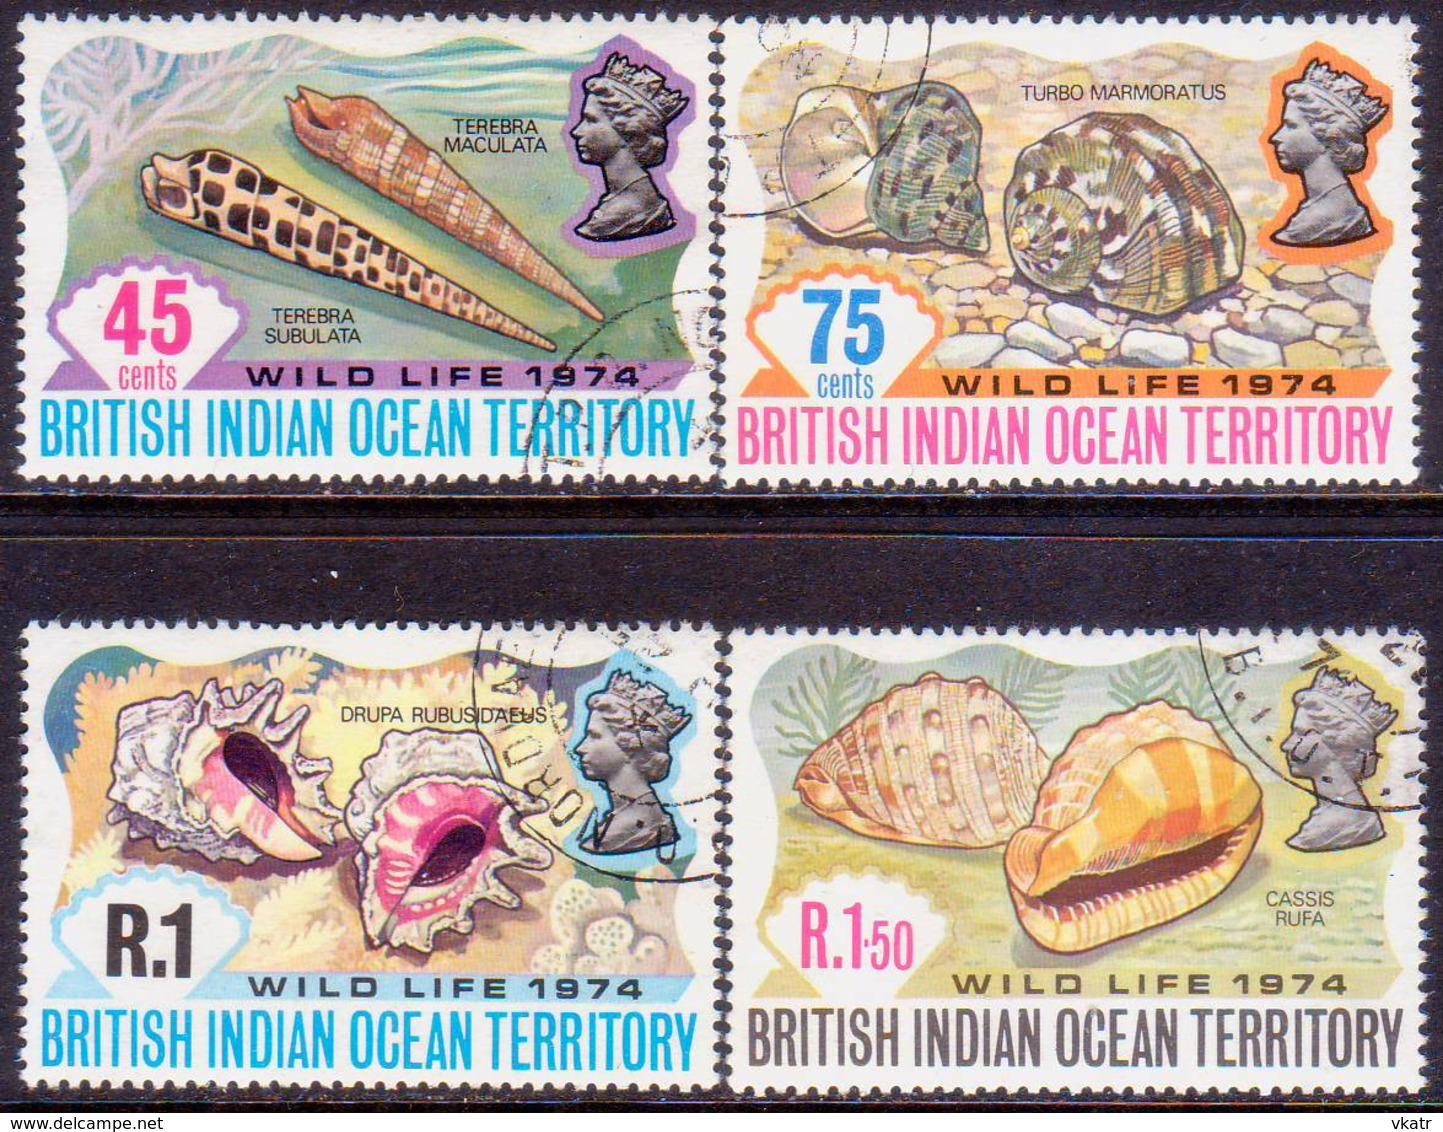 British Indian Ocean Territory 1974 SG 58-61 Compl.set Used Wildlife (2nd Series) - British Indian Ocean Territory (BIOT)